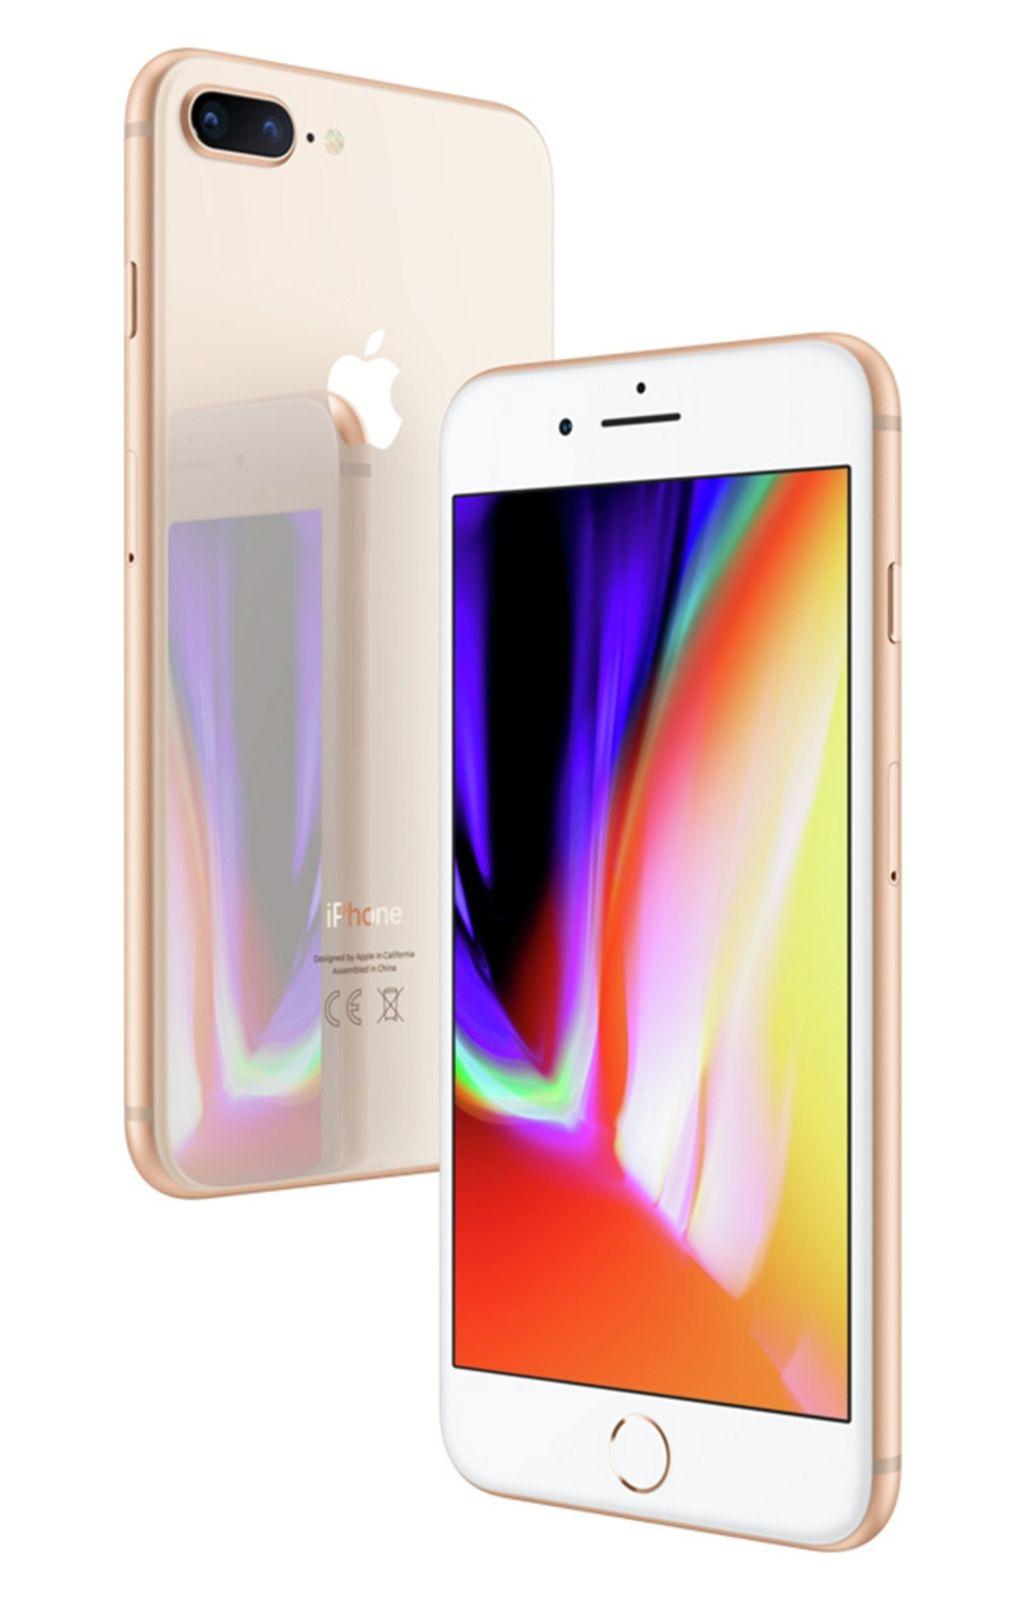 Refurbished Apple iPhone 8 Plus 5.5 Inch 64GB SIM Free Unlocked Mobile Phone - Gold, £387.99 at Argos/ebay